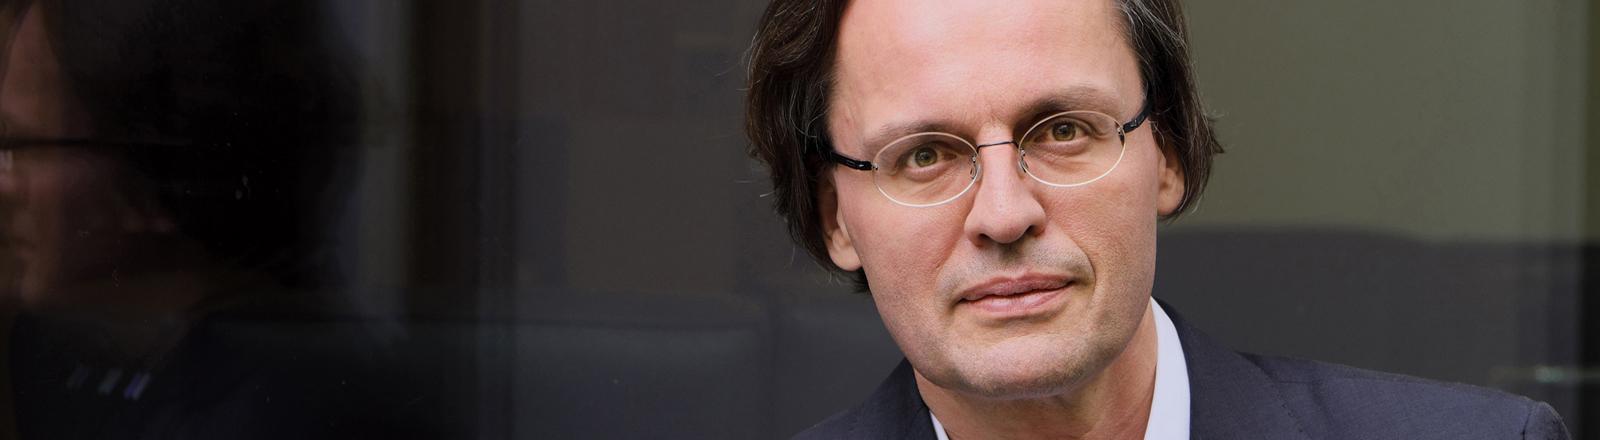 Bernhard Pörksen